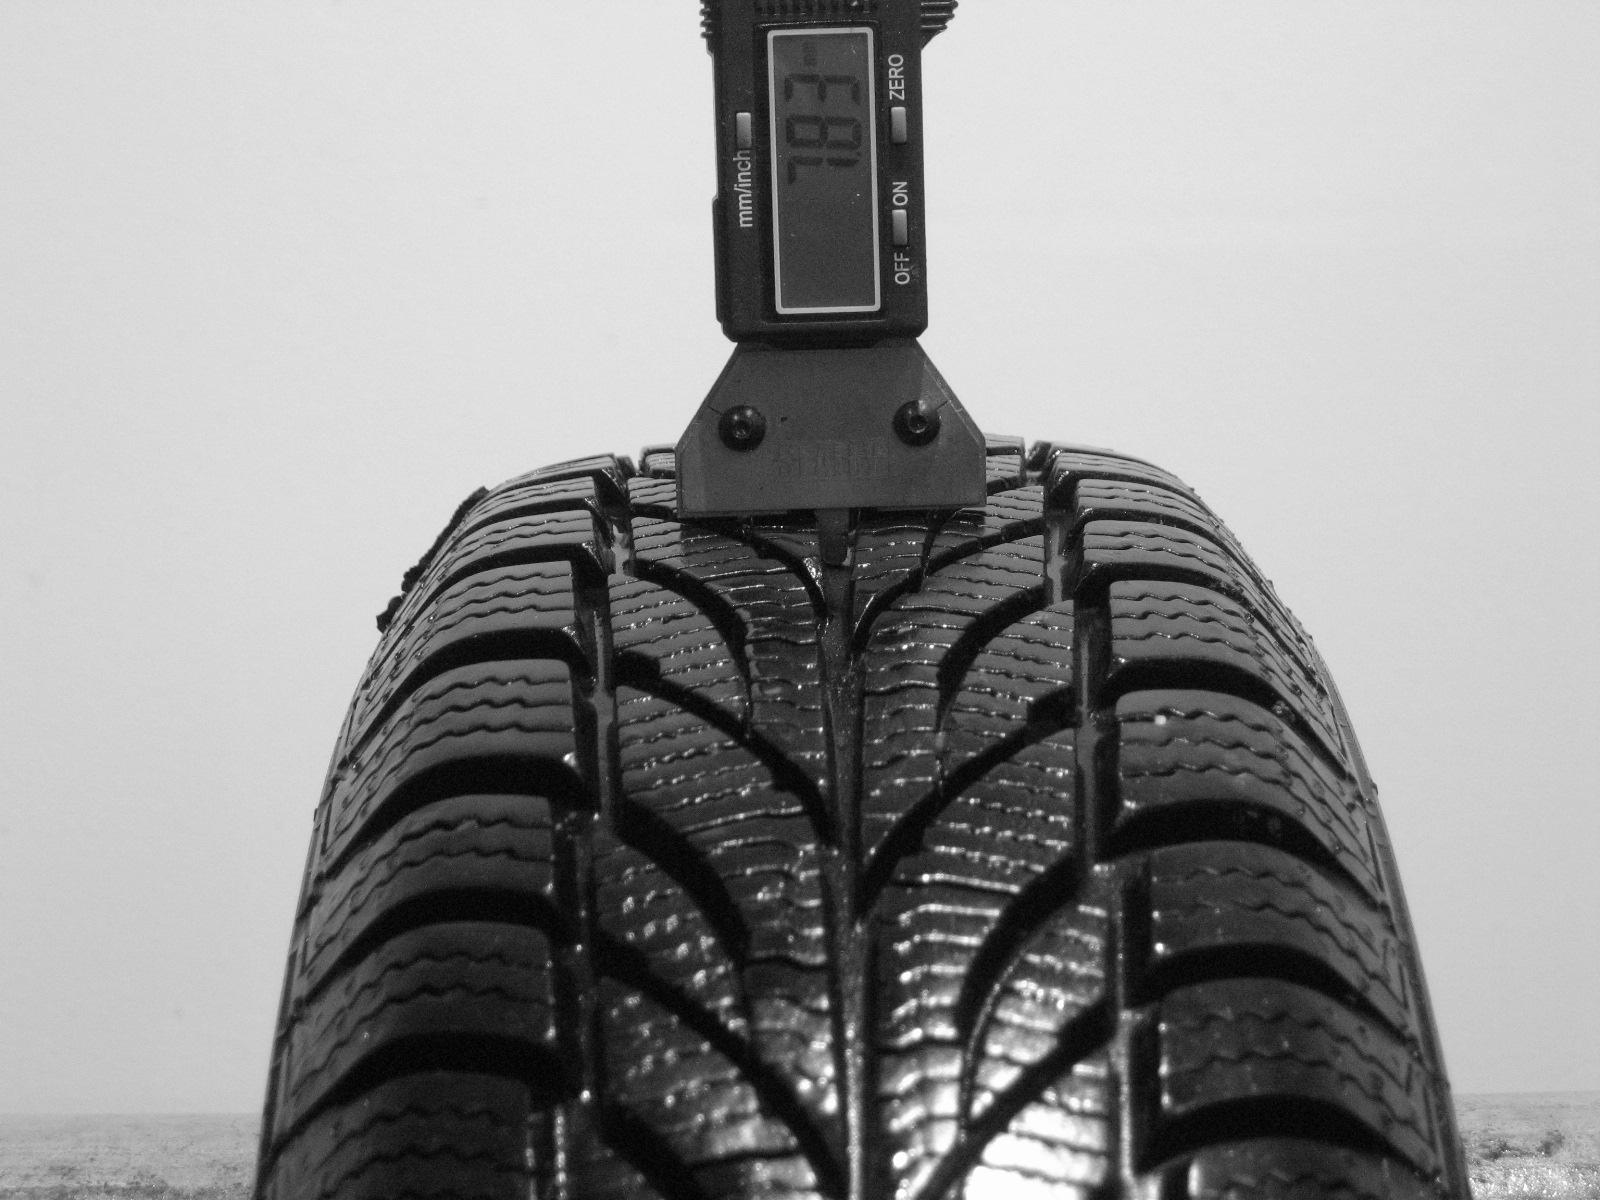 Použité-Pneu-Bazar - 155/70 R13 SPORTIVA SNOW WIN -kusovka-rezerva 3mm